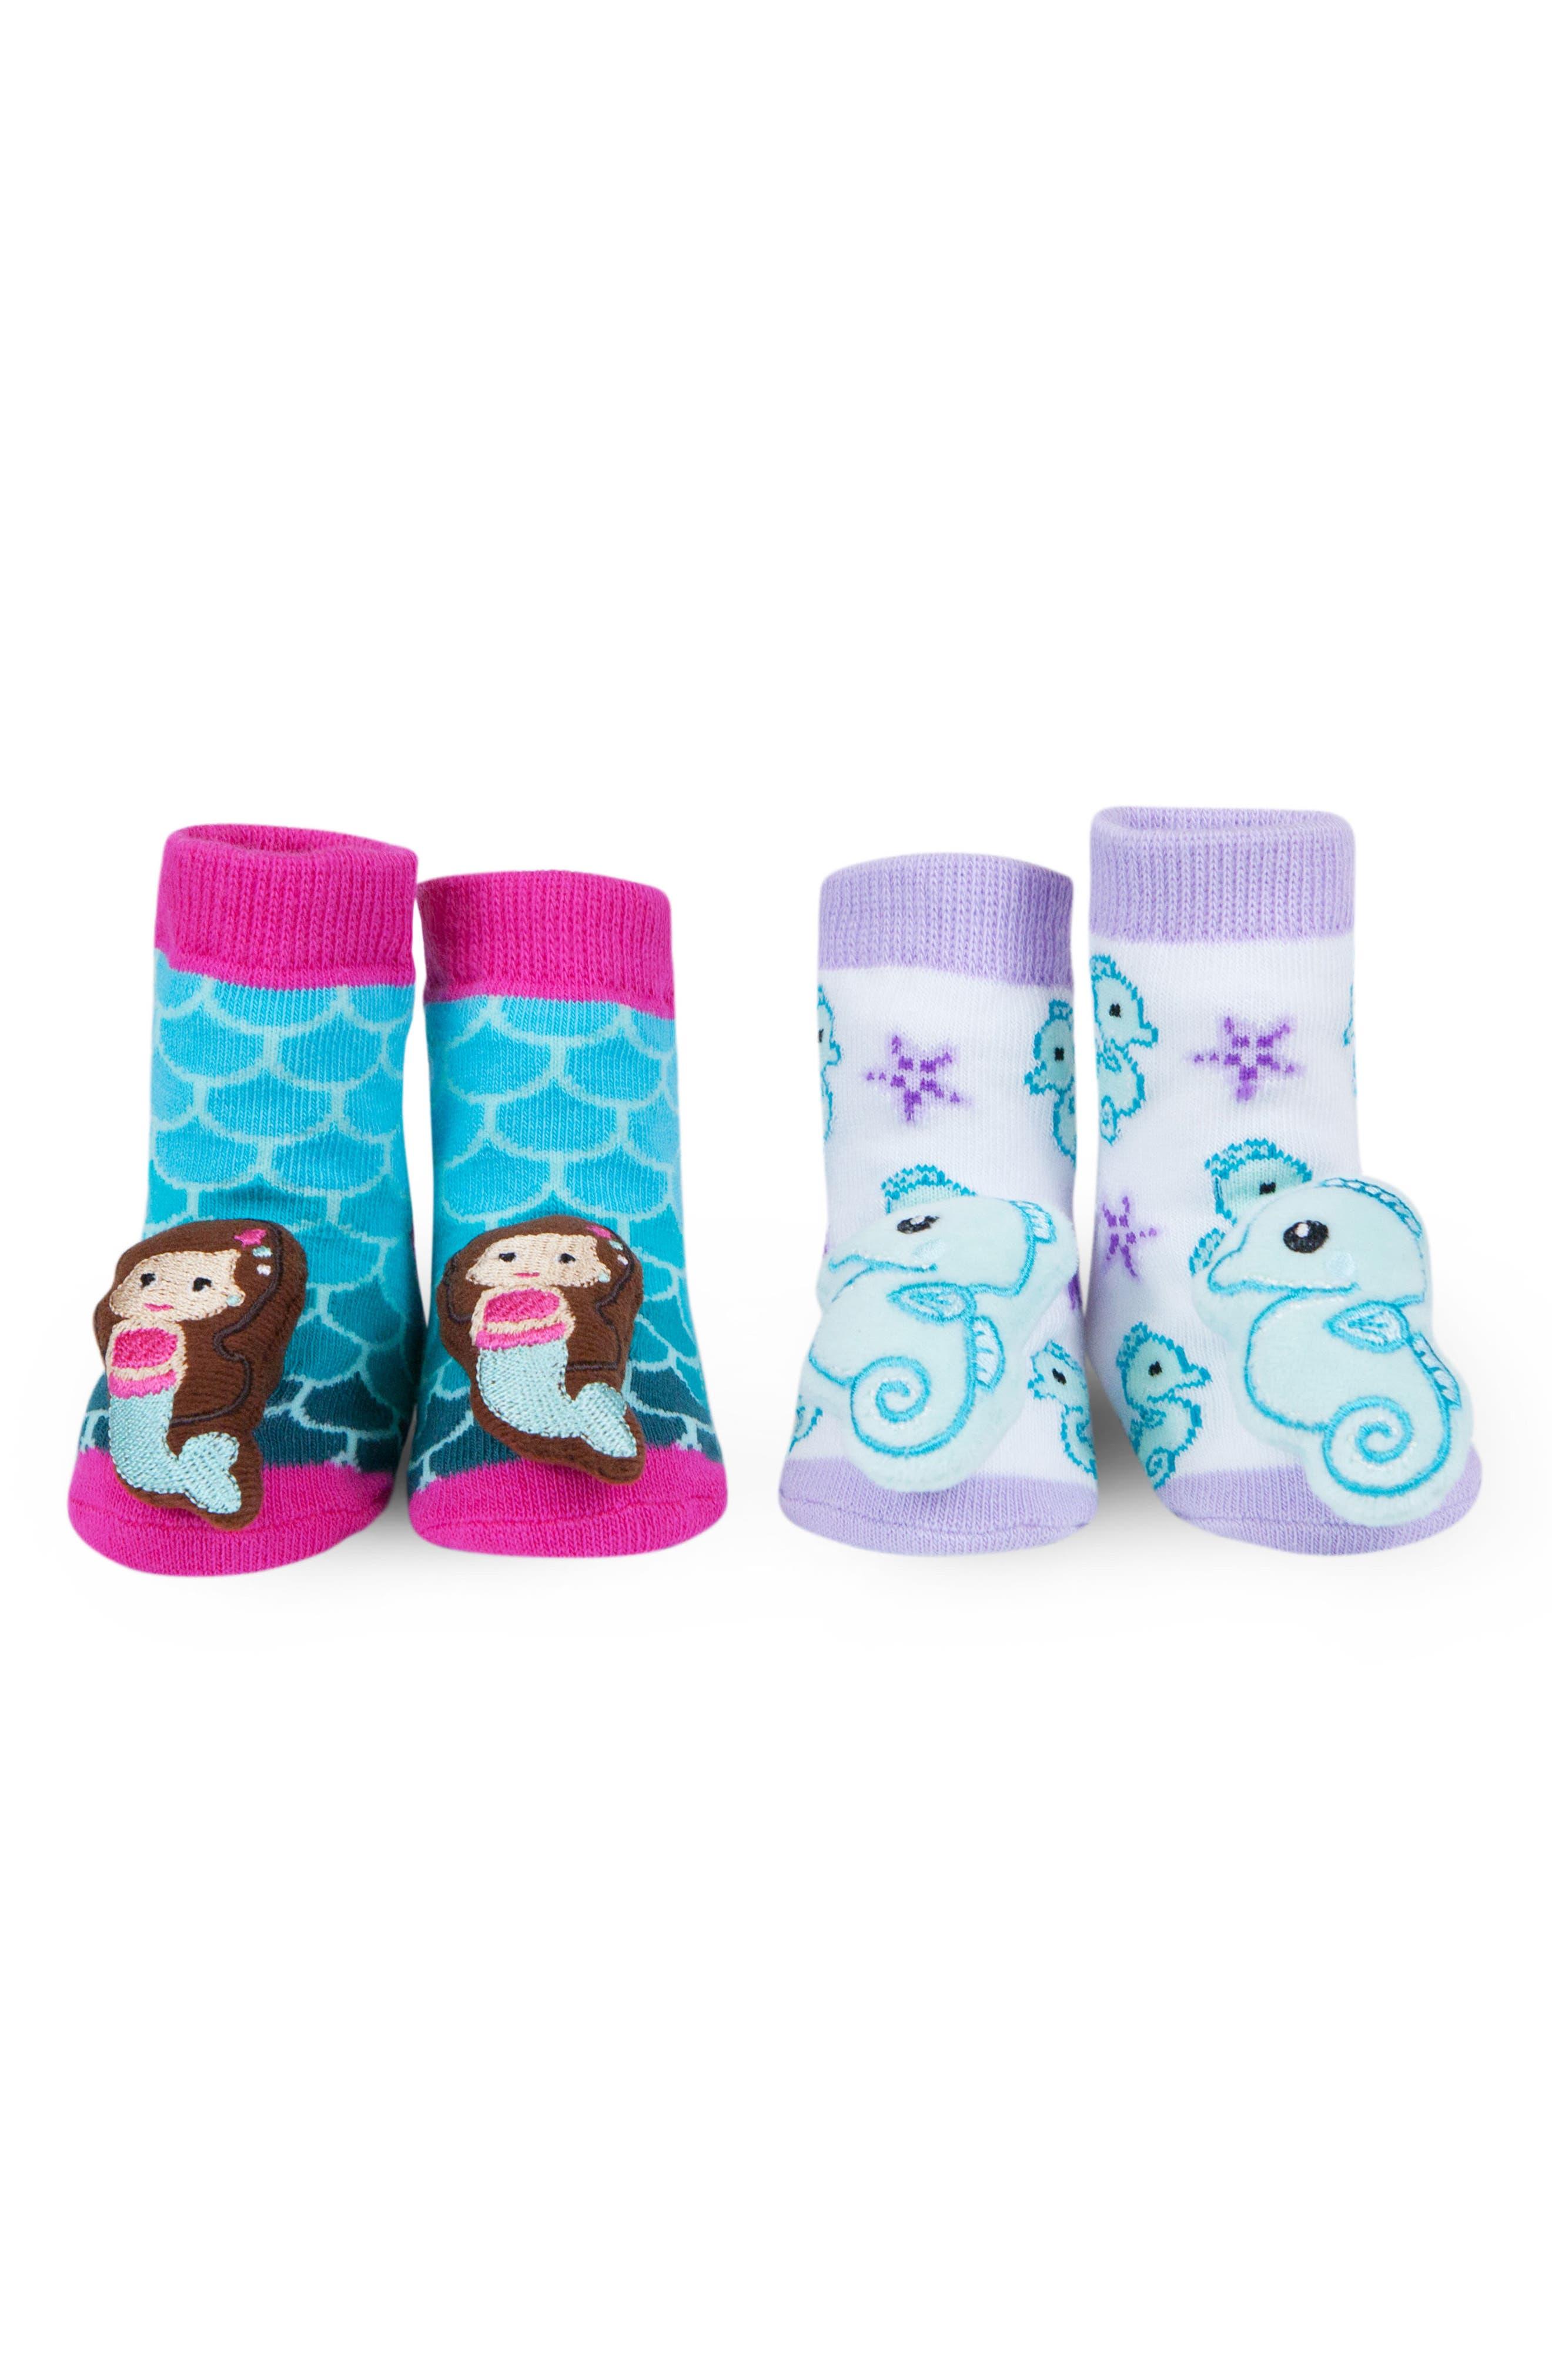 Mermaids 2-Pack Rattle Socks,                             Main thumbnail 1, color,                             650